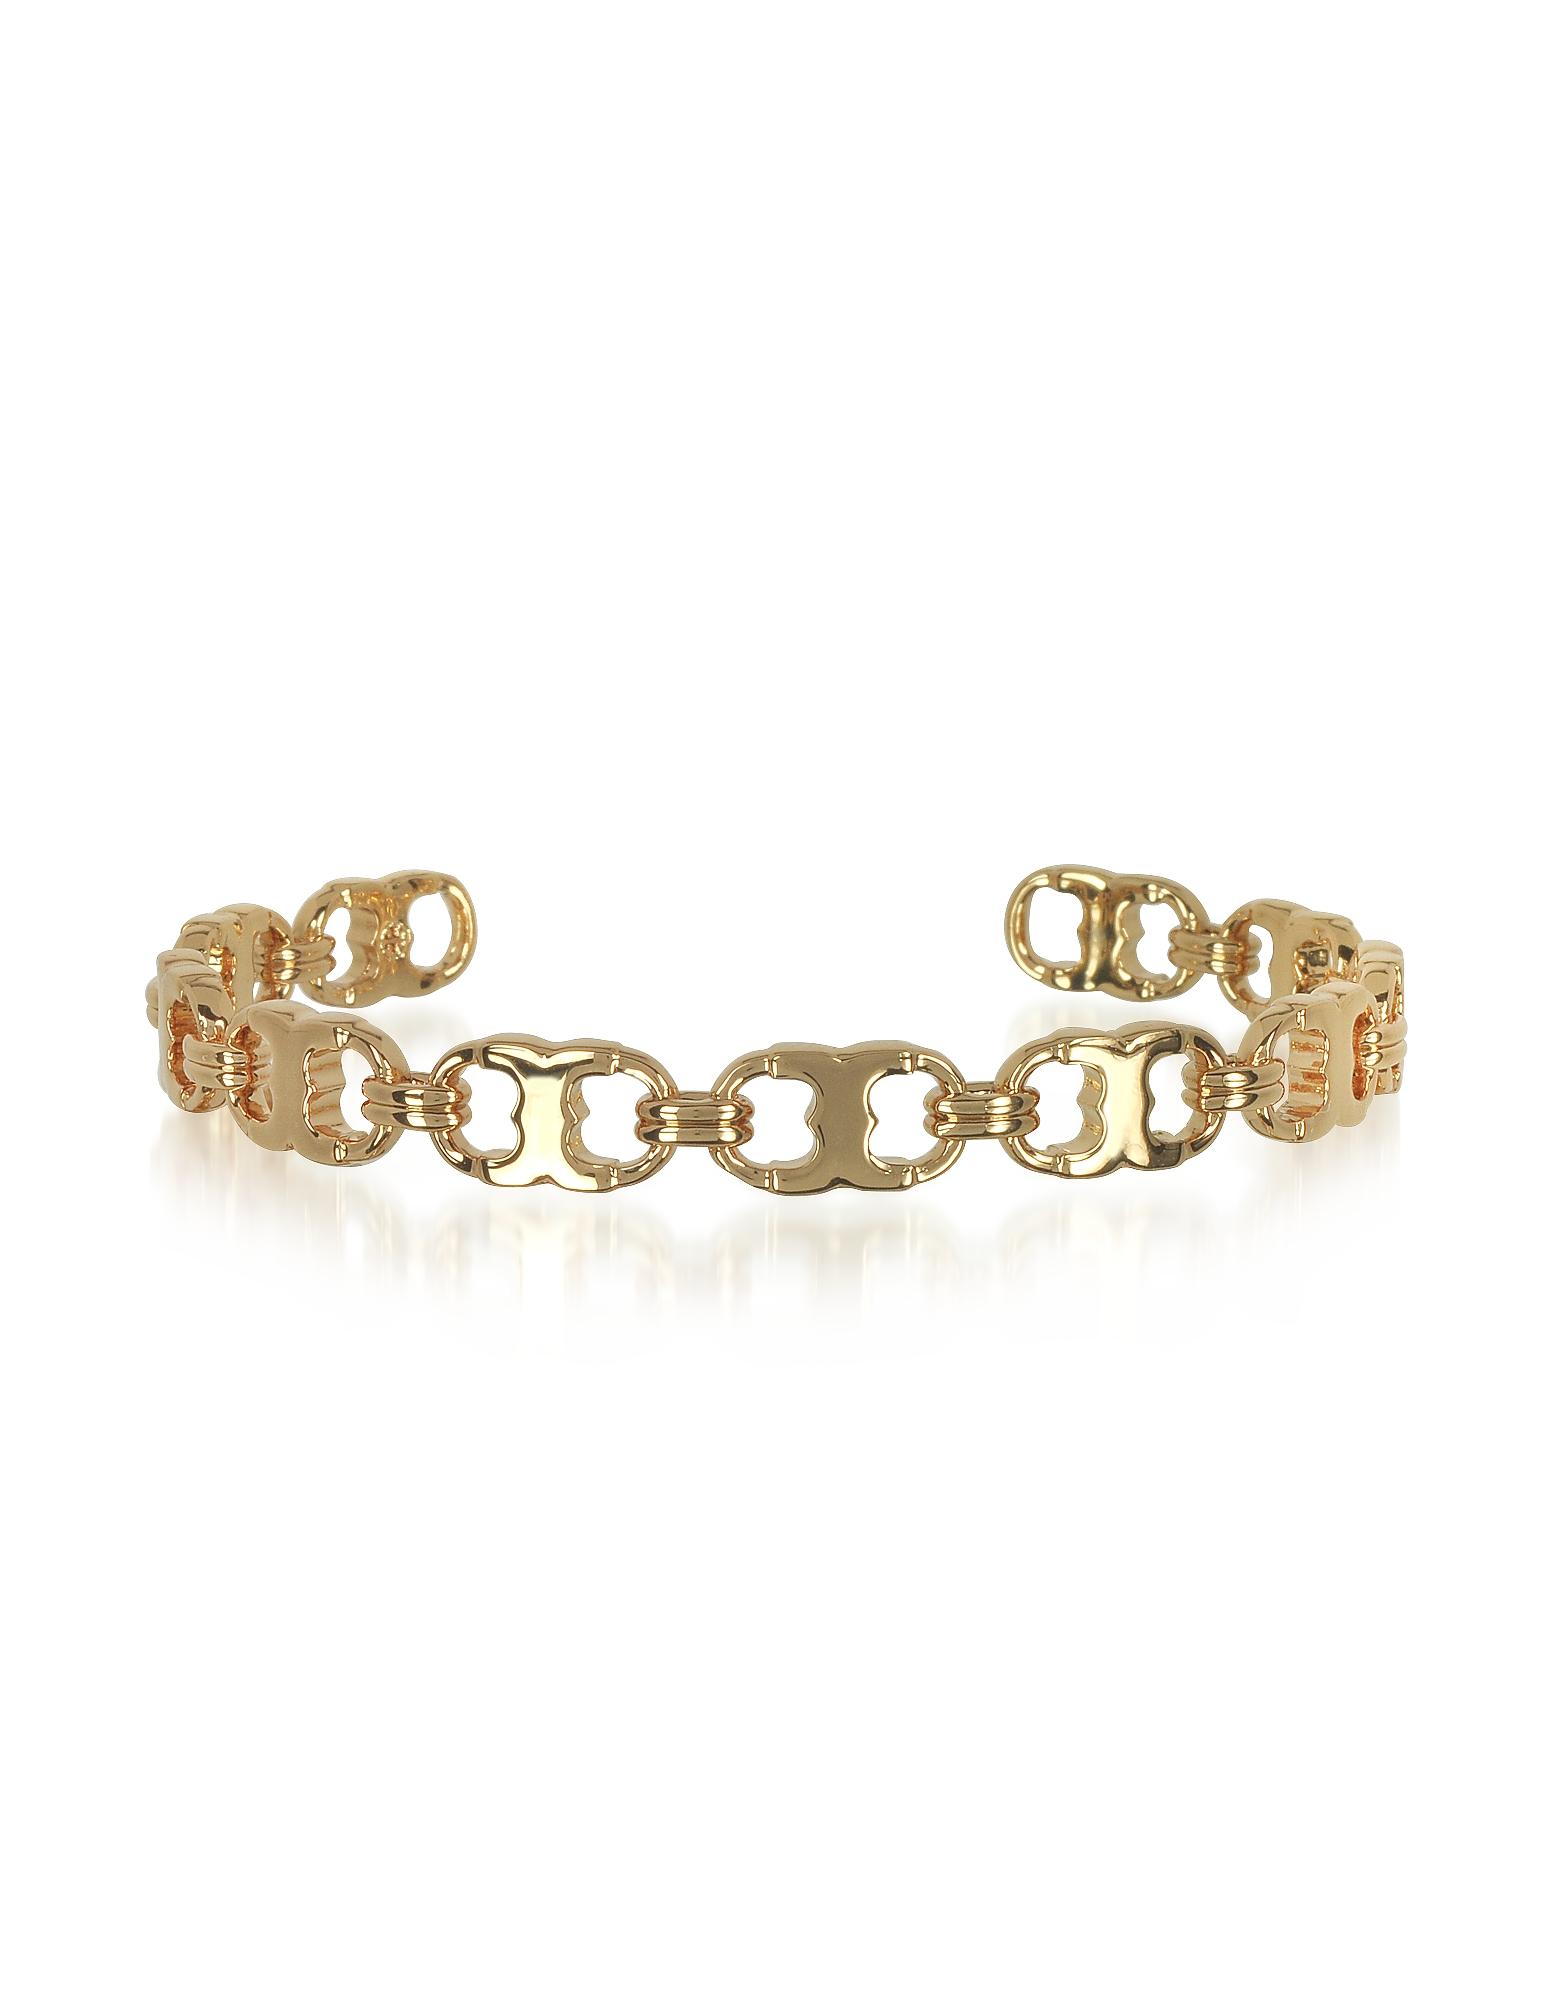 Tory Burch Bracelets, Gemini Link Hinge Bracelet